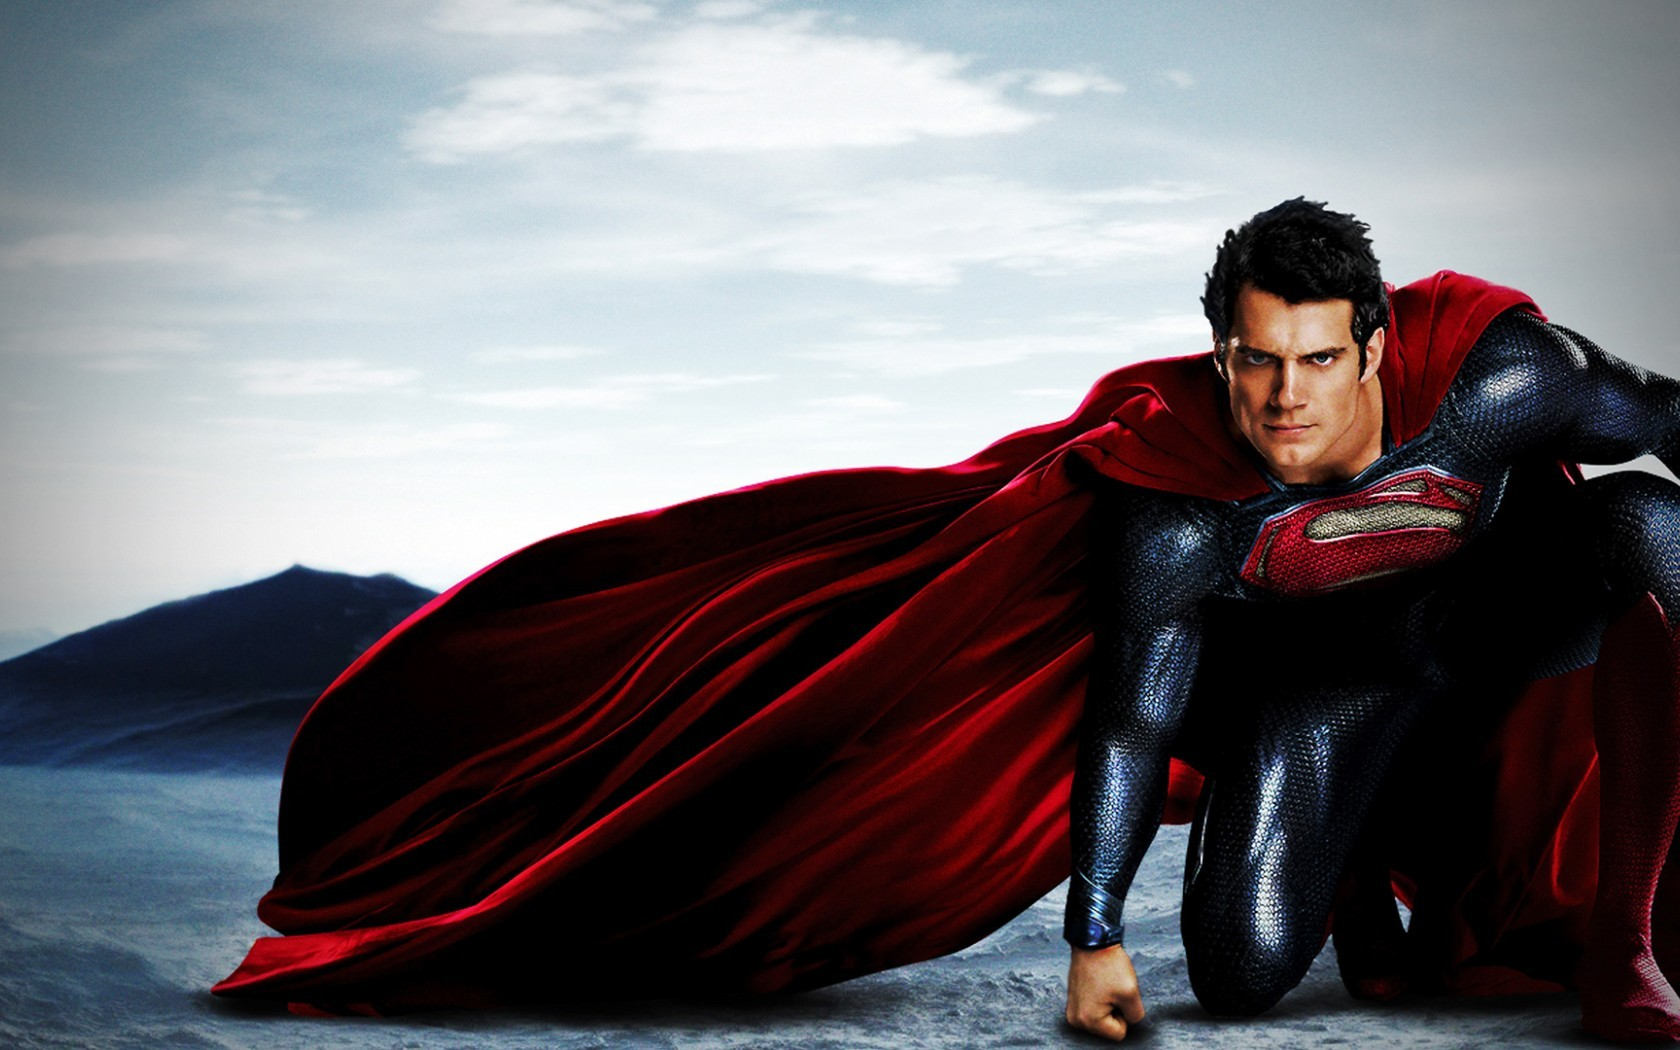 Henry Cavill Superman Man of Steel HD Wallpaper 3882 1680x1050